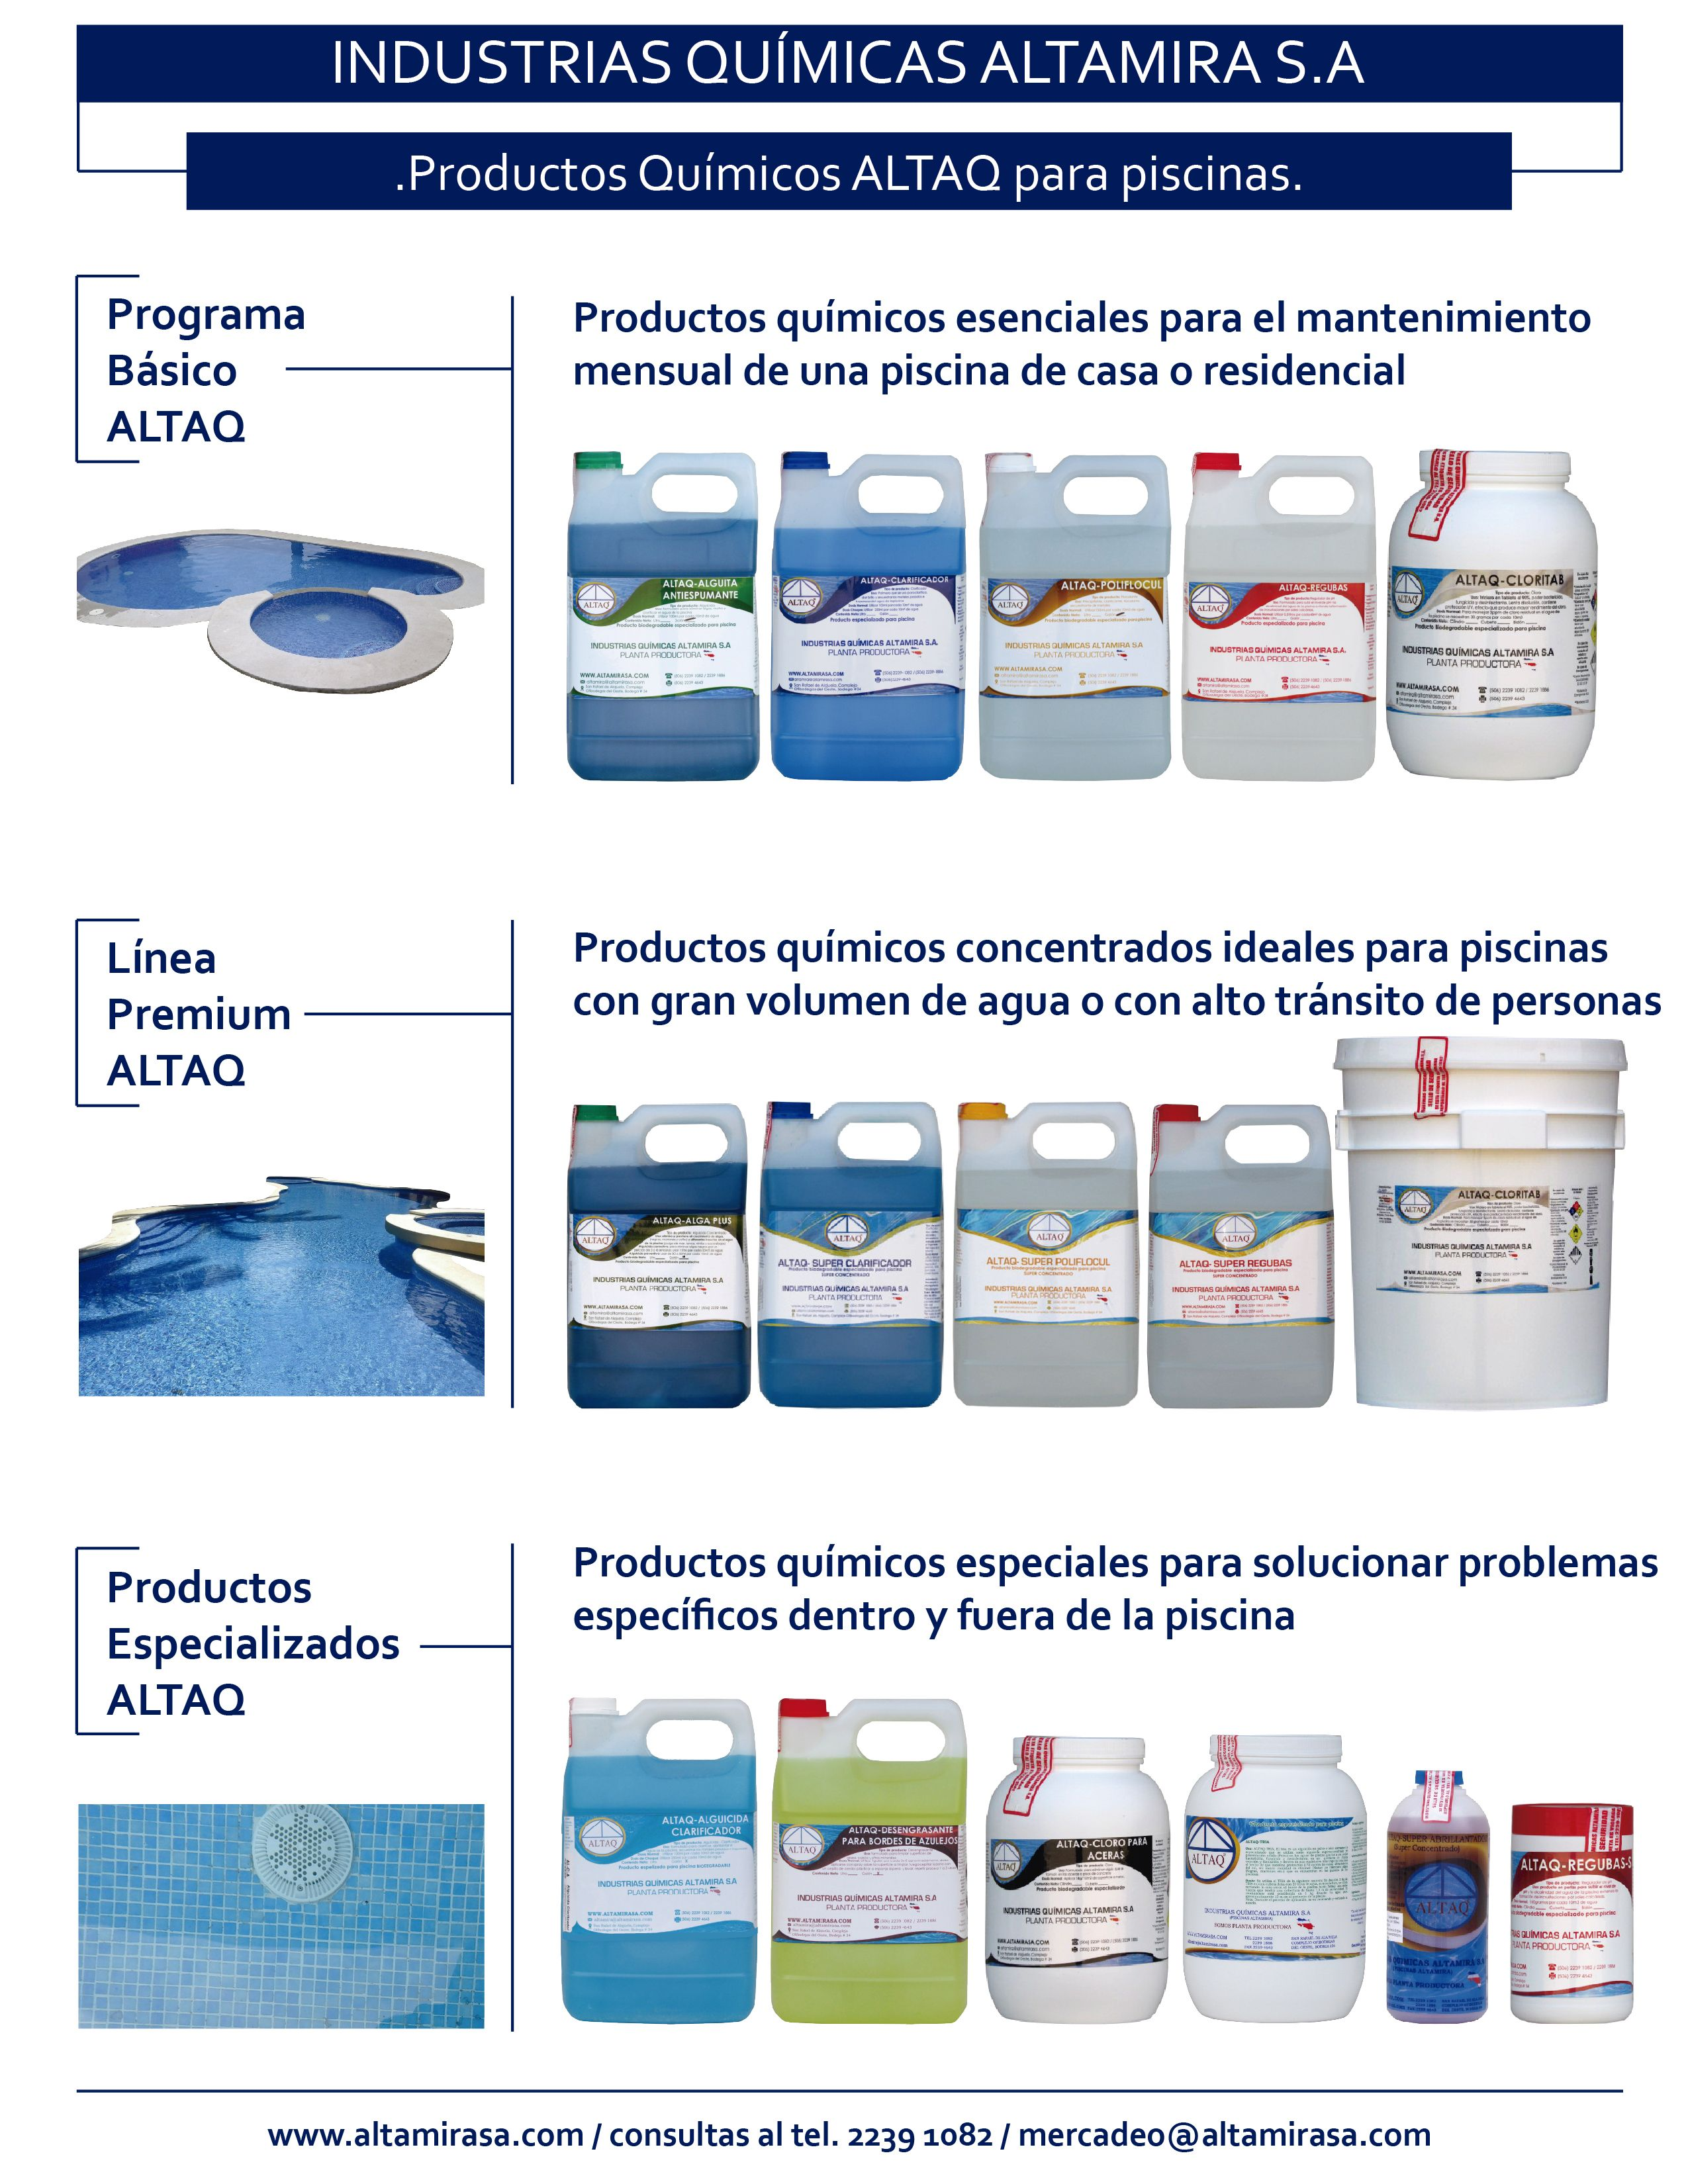 Productos para piscinas capacitaci n altaq productos for Productos para piscinas